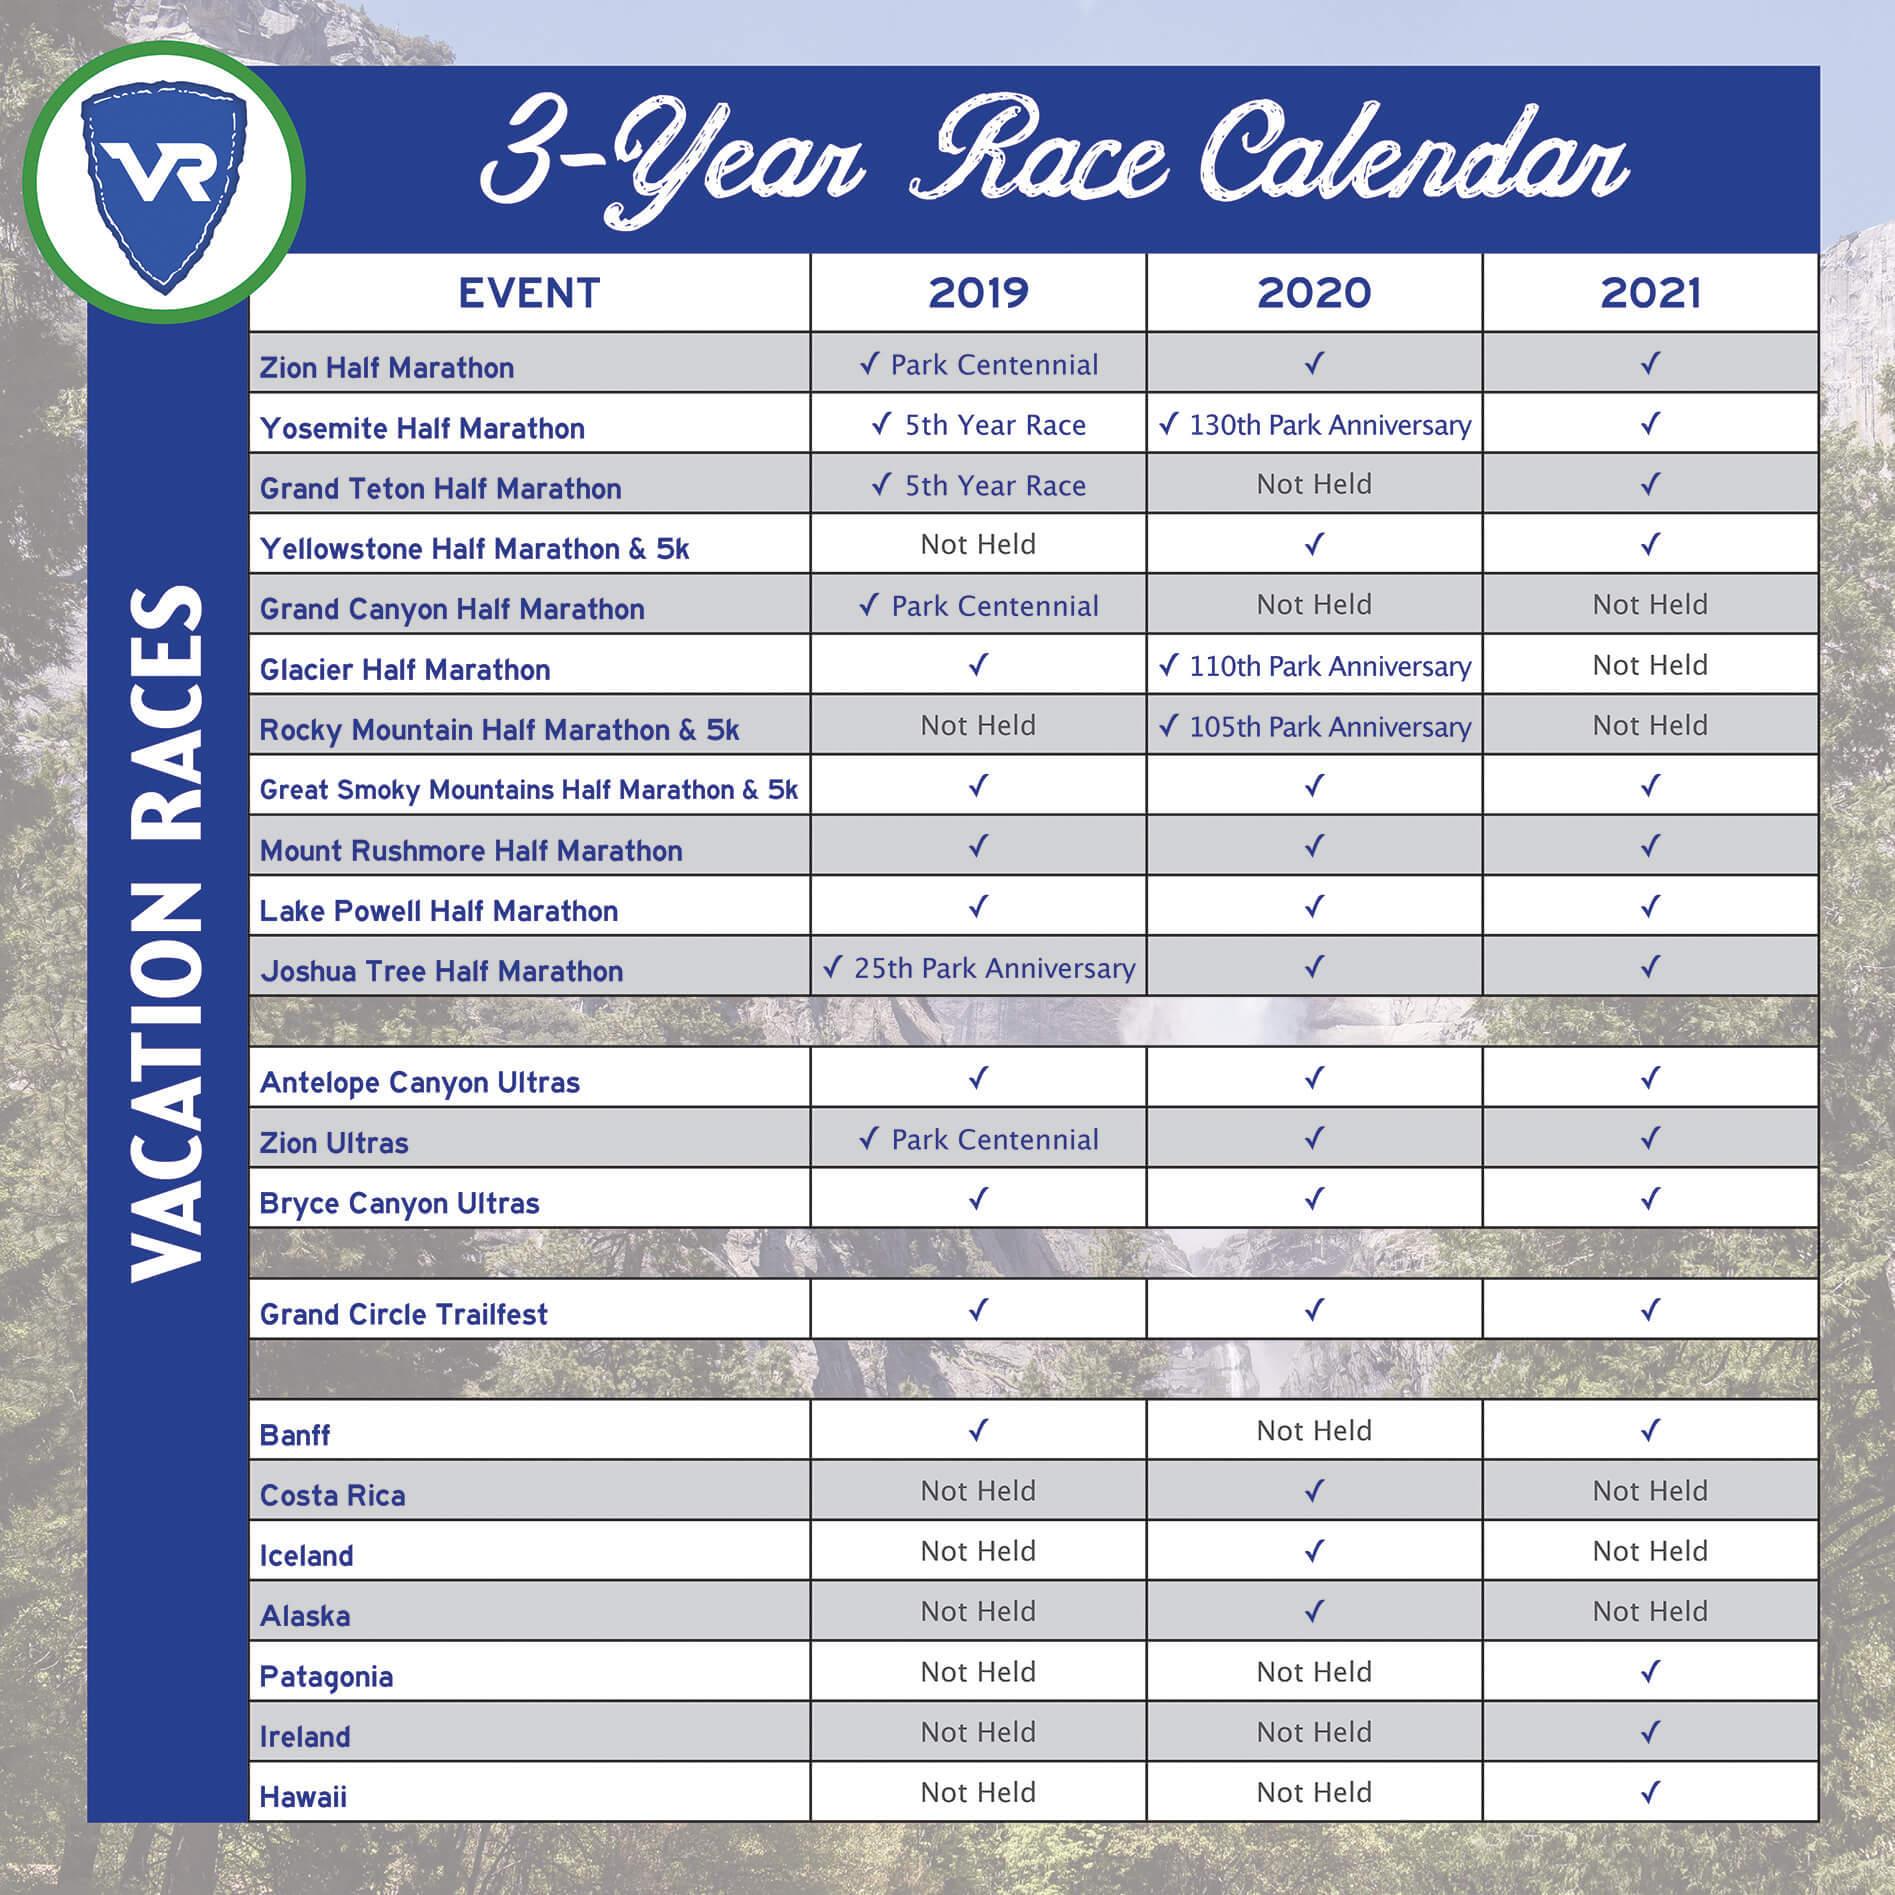 Race Calendar.3 Year Race Calendar Schedule Rotation And Race Logo Previews